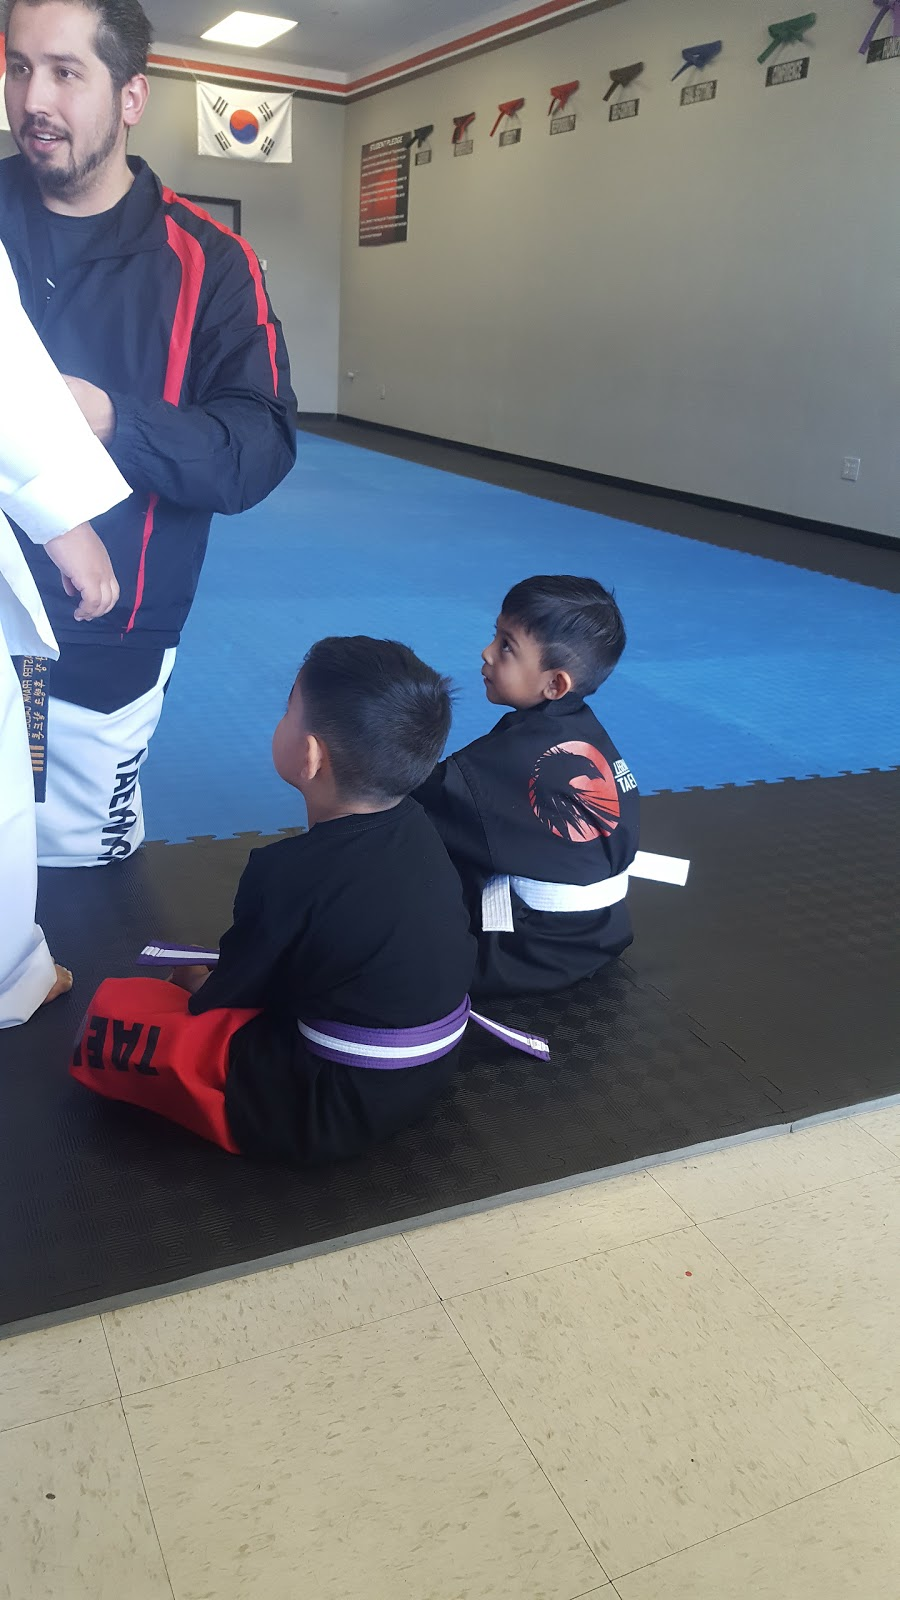 Legendary Heroes Taekwondo - health  | Photo 2 of 4 | Address: 14755 Foothill Blvd # F, Fontana, CA 92335, USA | Phone: (909) 237-5425